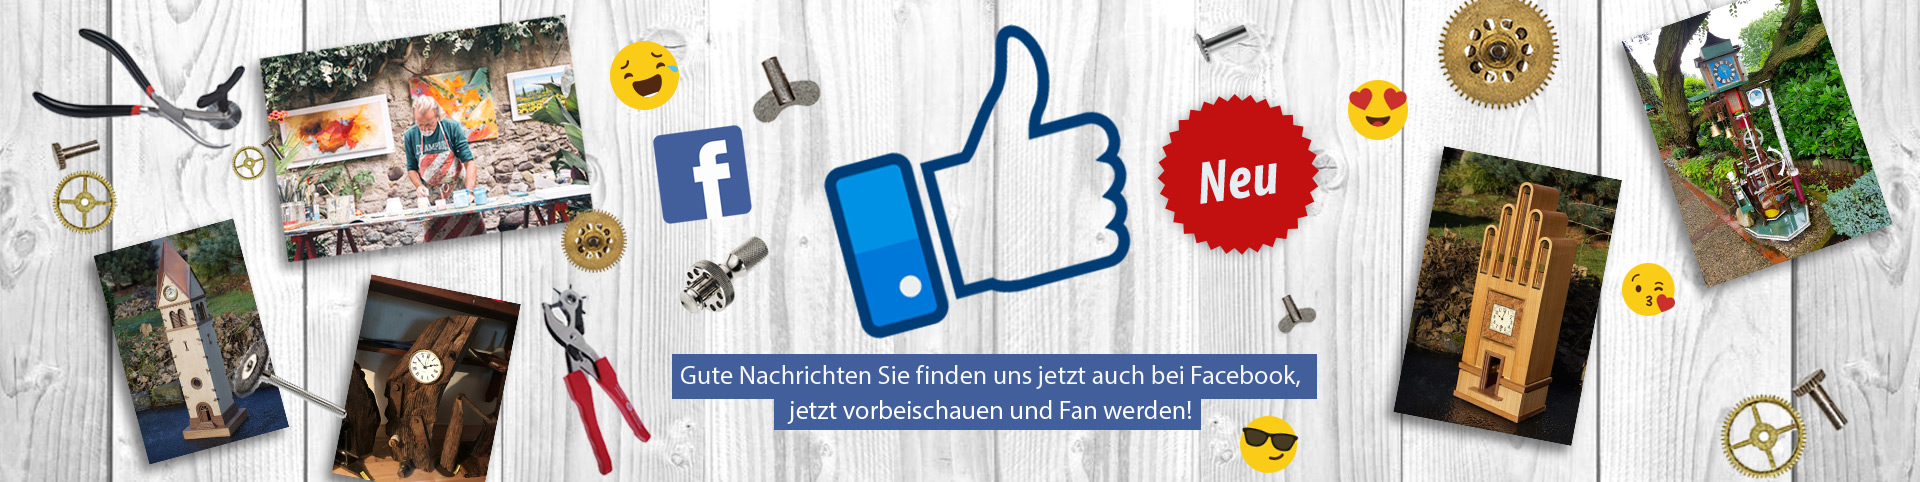 Facebook Selva Technik